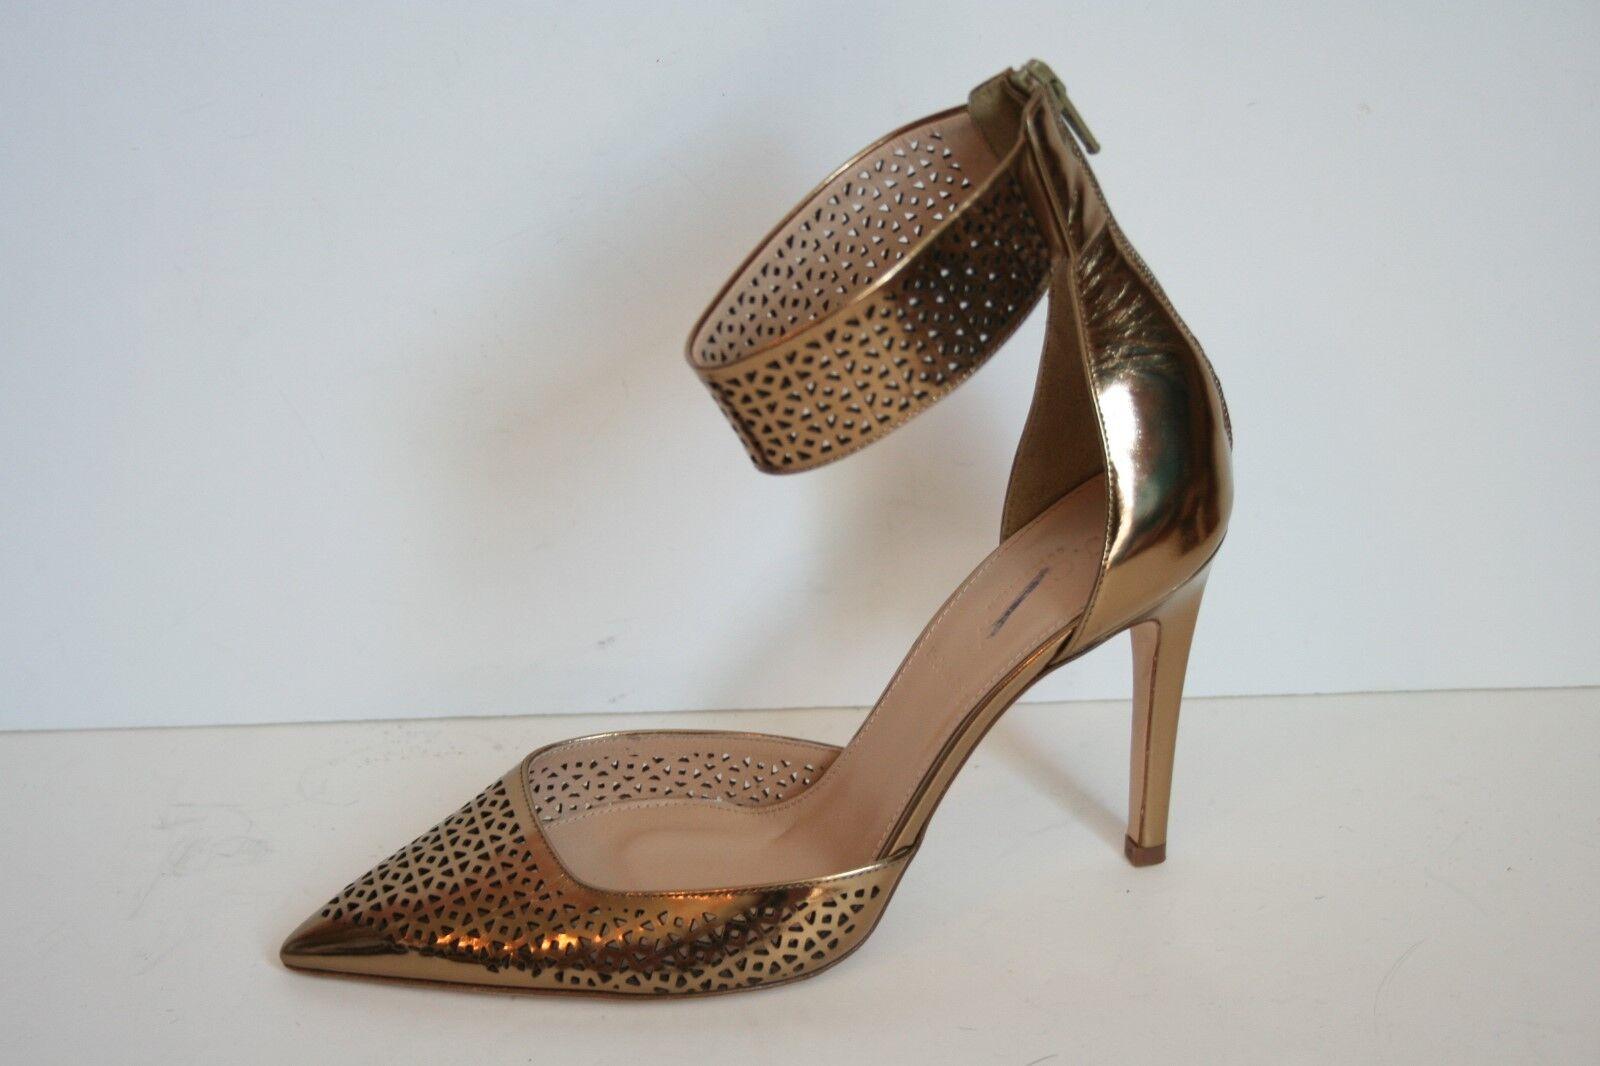 JCrew Collection Natasha Perforated Mirror Metallic Pumps 7.5 Dark Gold Ankle